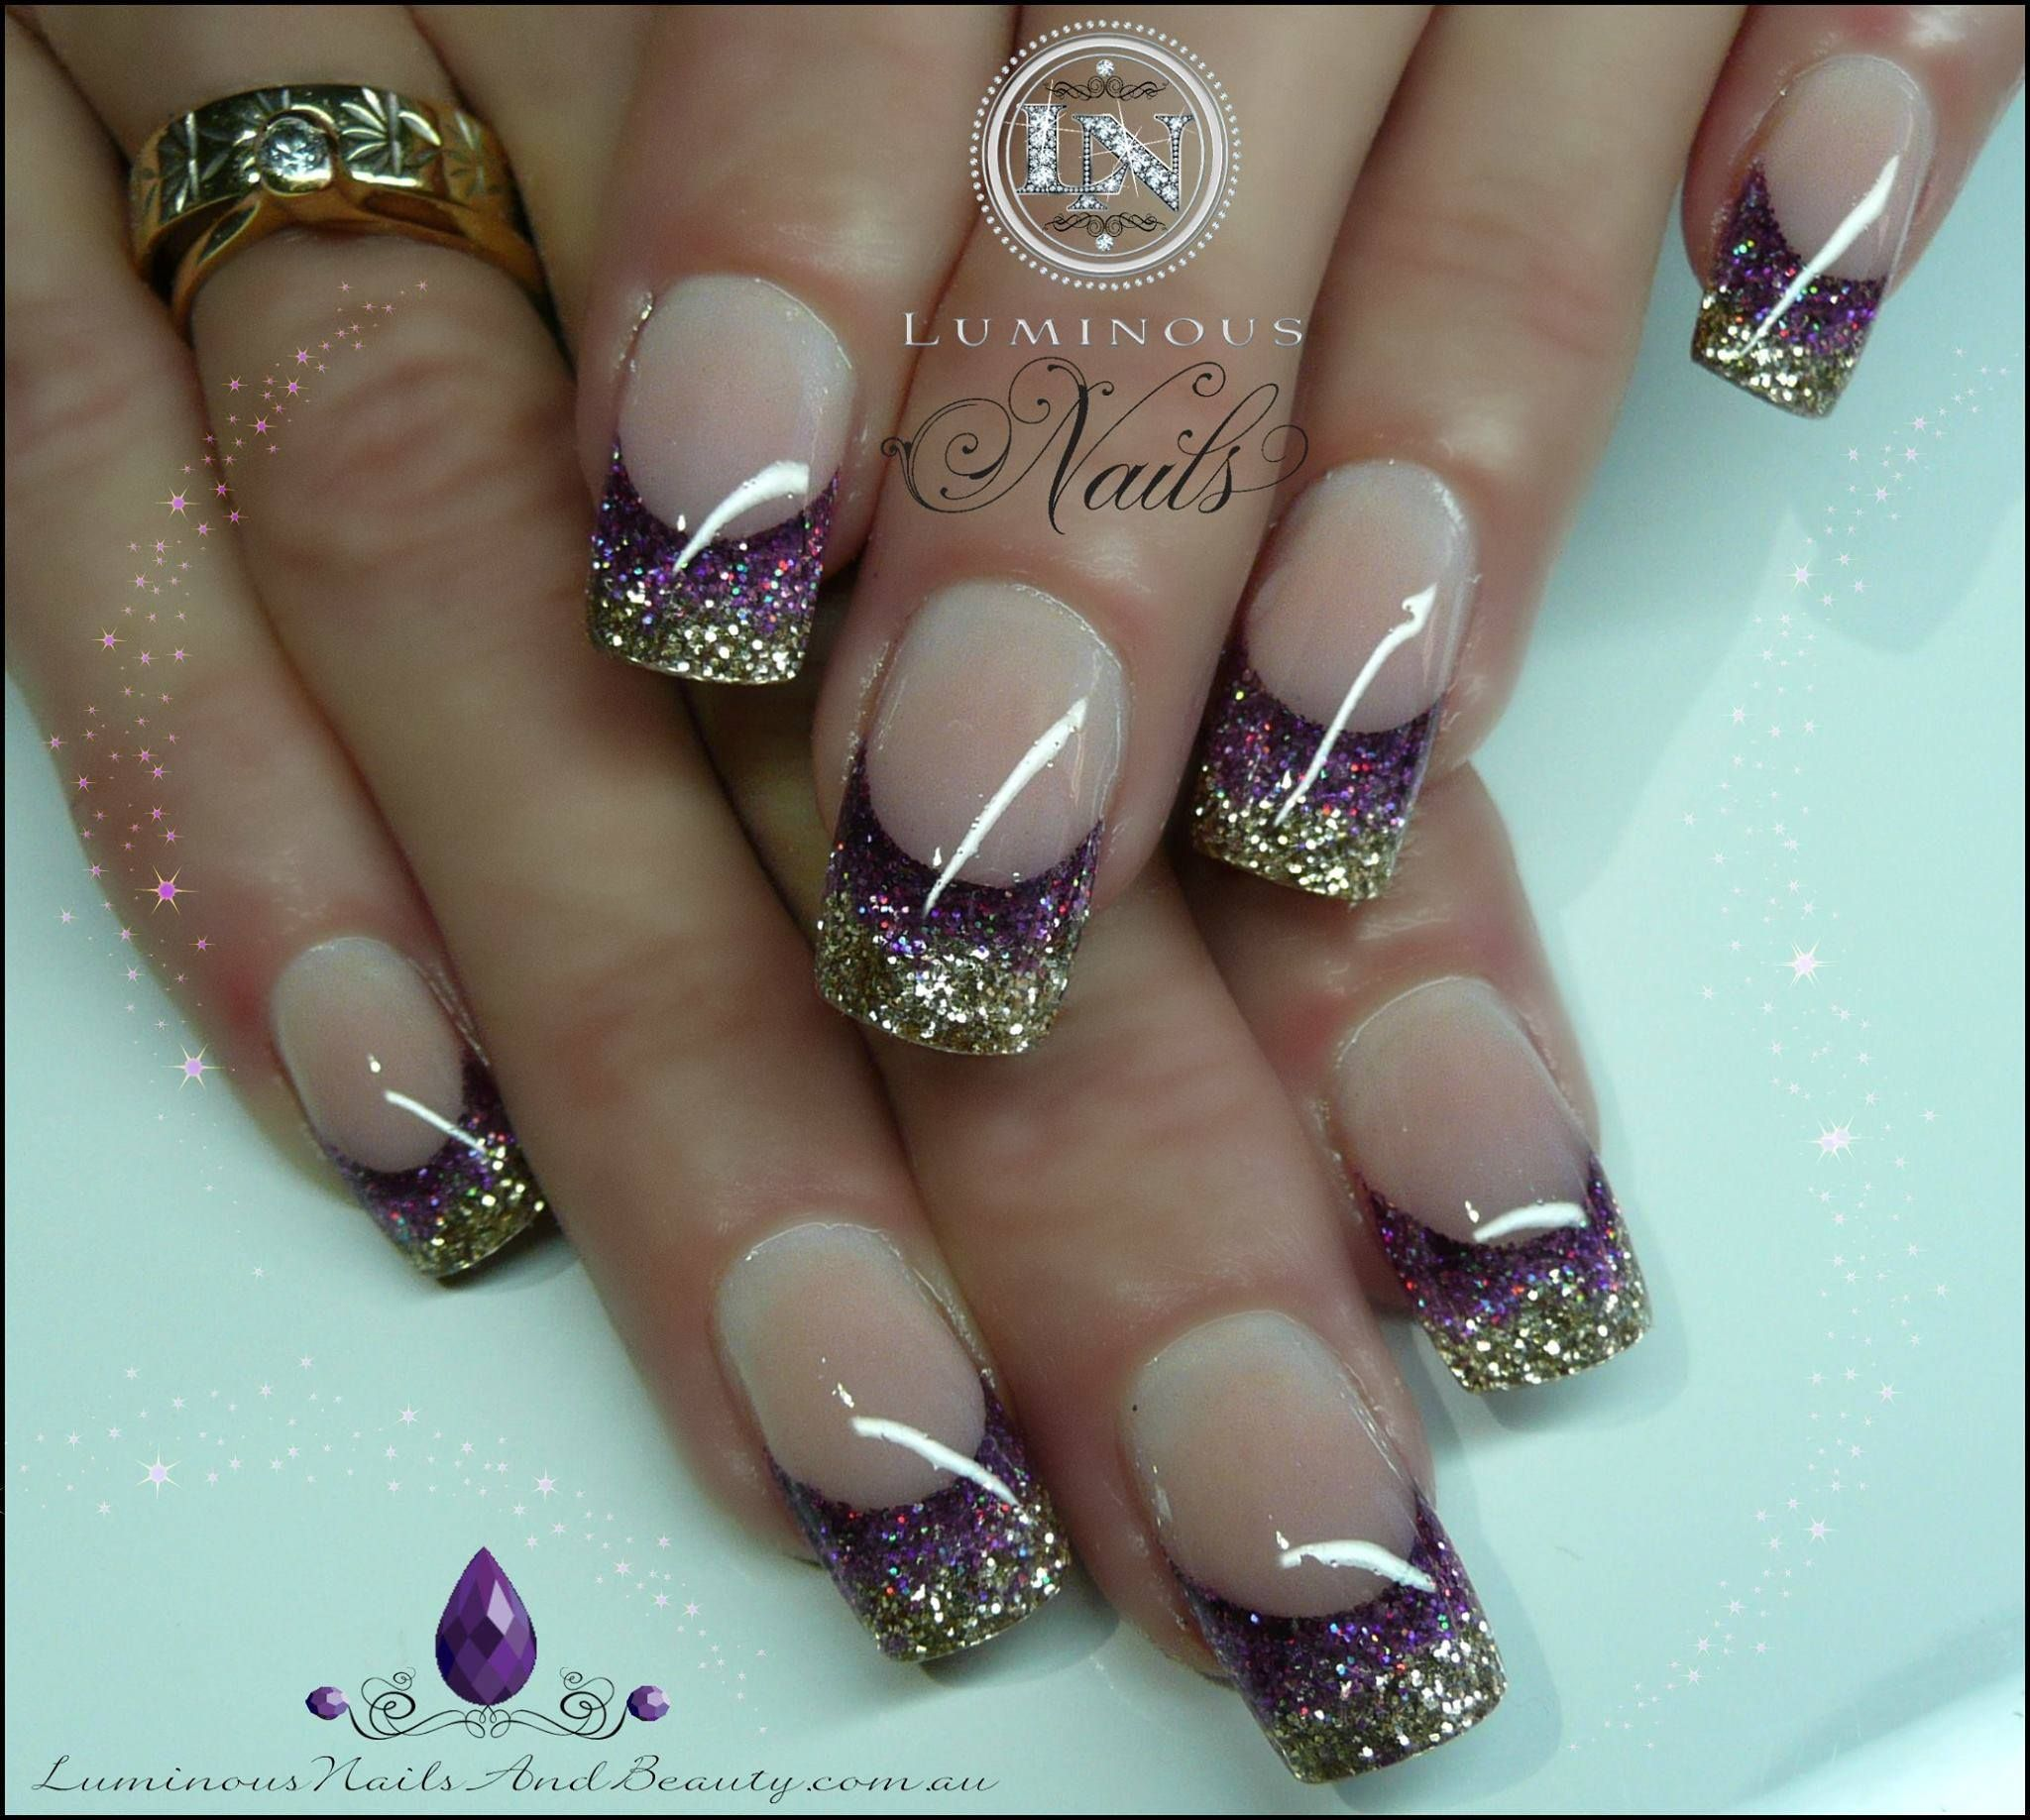 Pink black zebra | Zebra nails, Crystal nails, Luminous nails